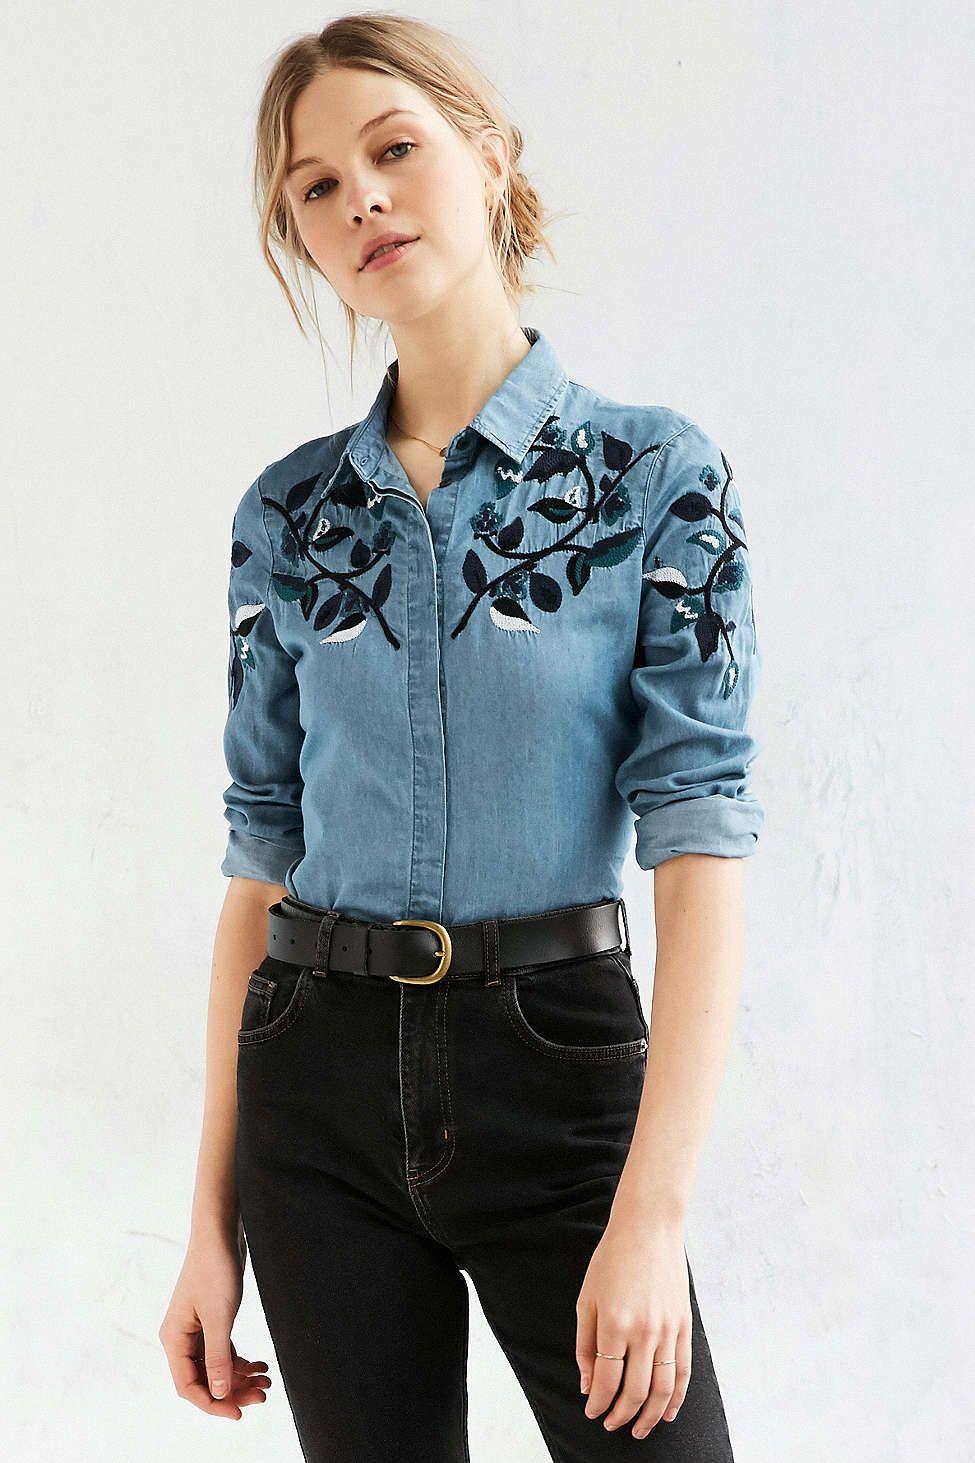 Nafis Long Embroidered Buttondown Dress Shirt - Gray